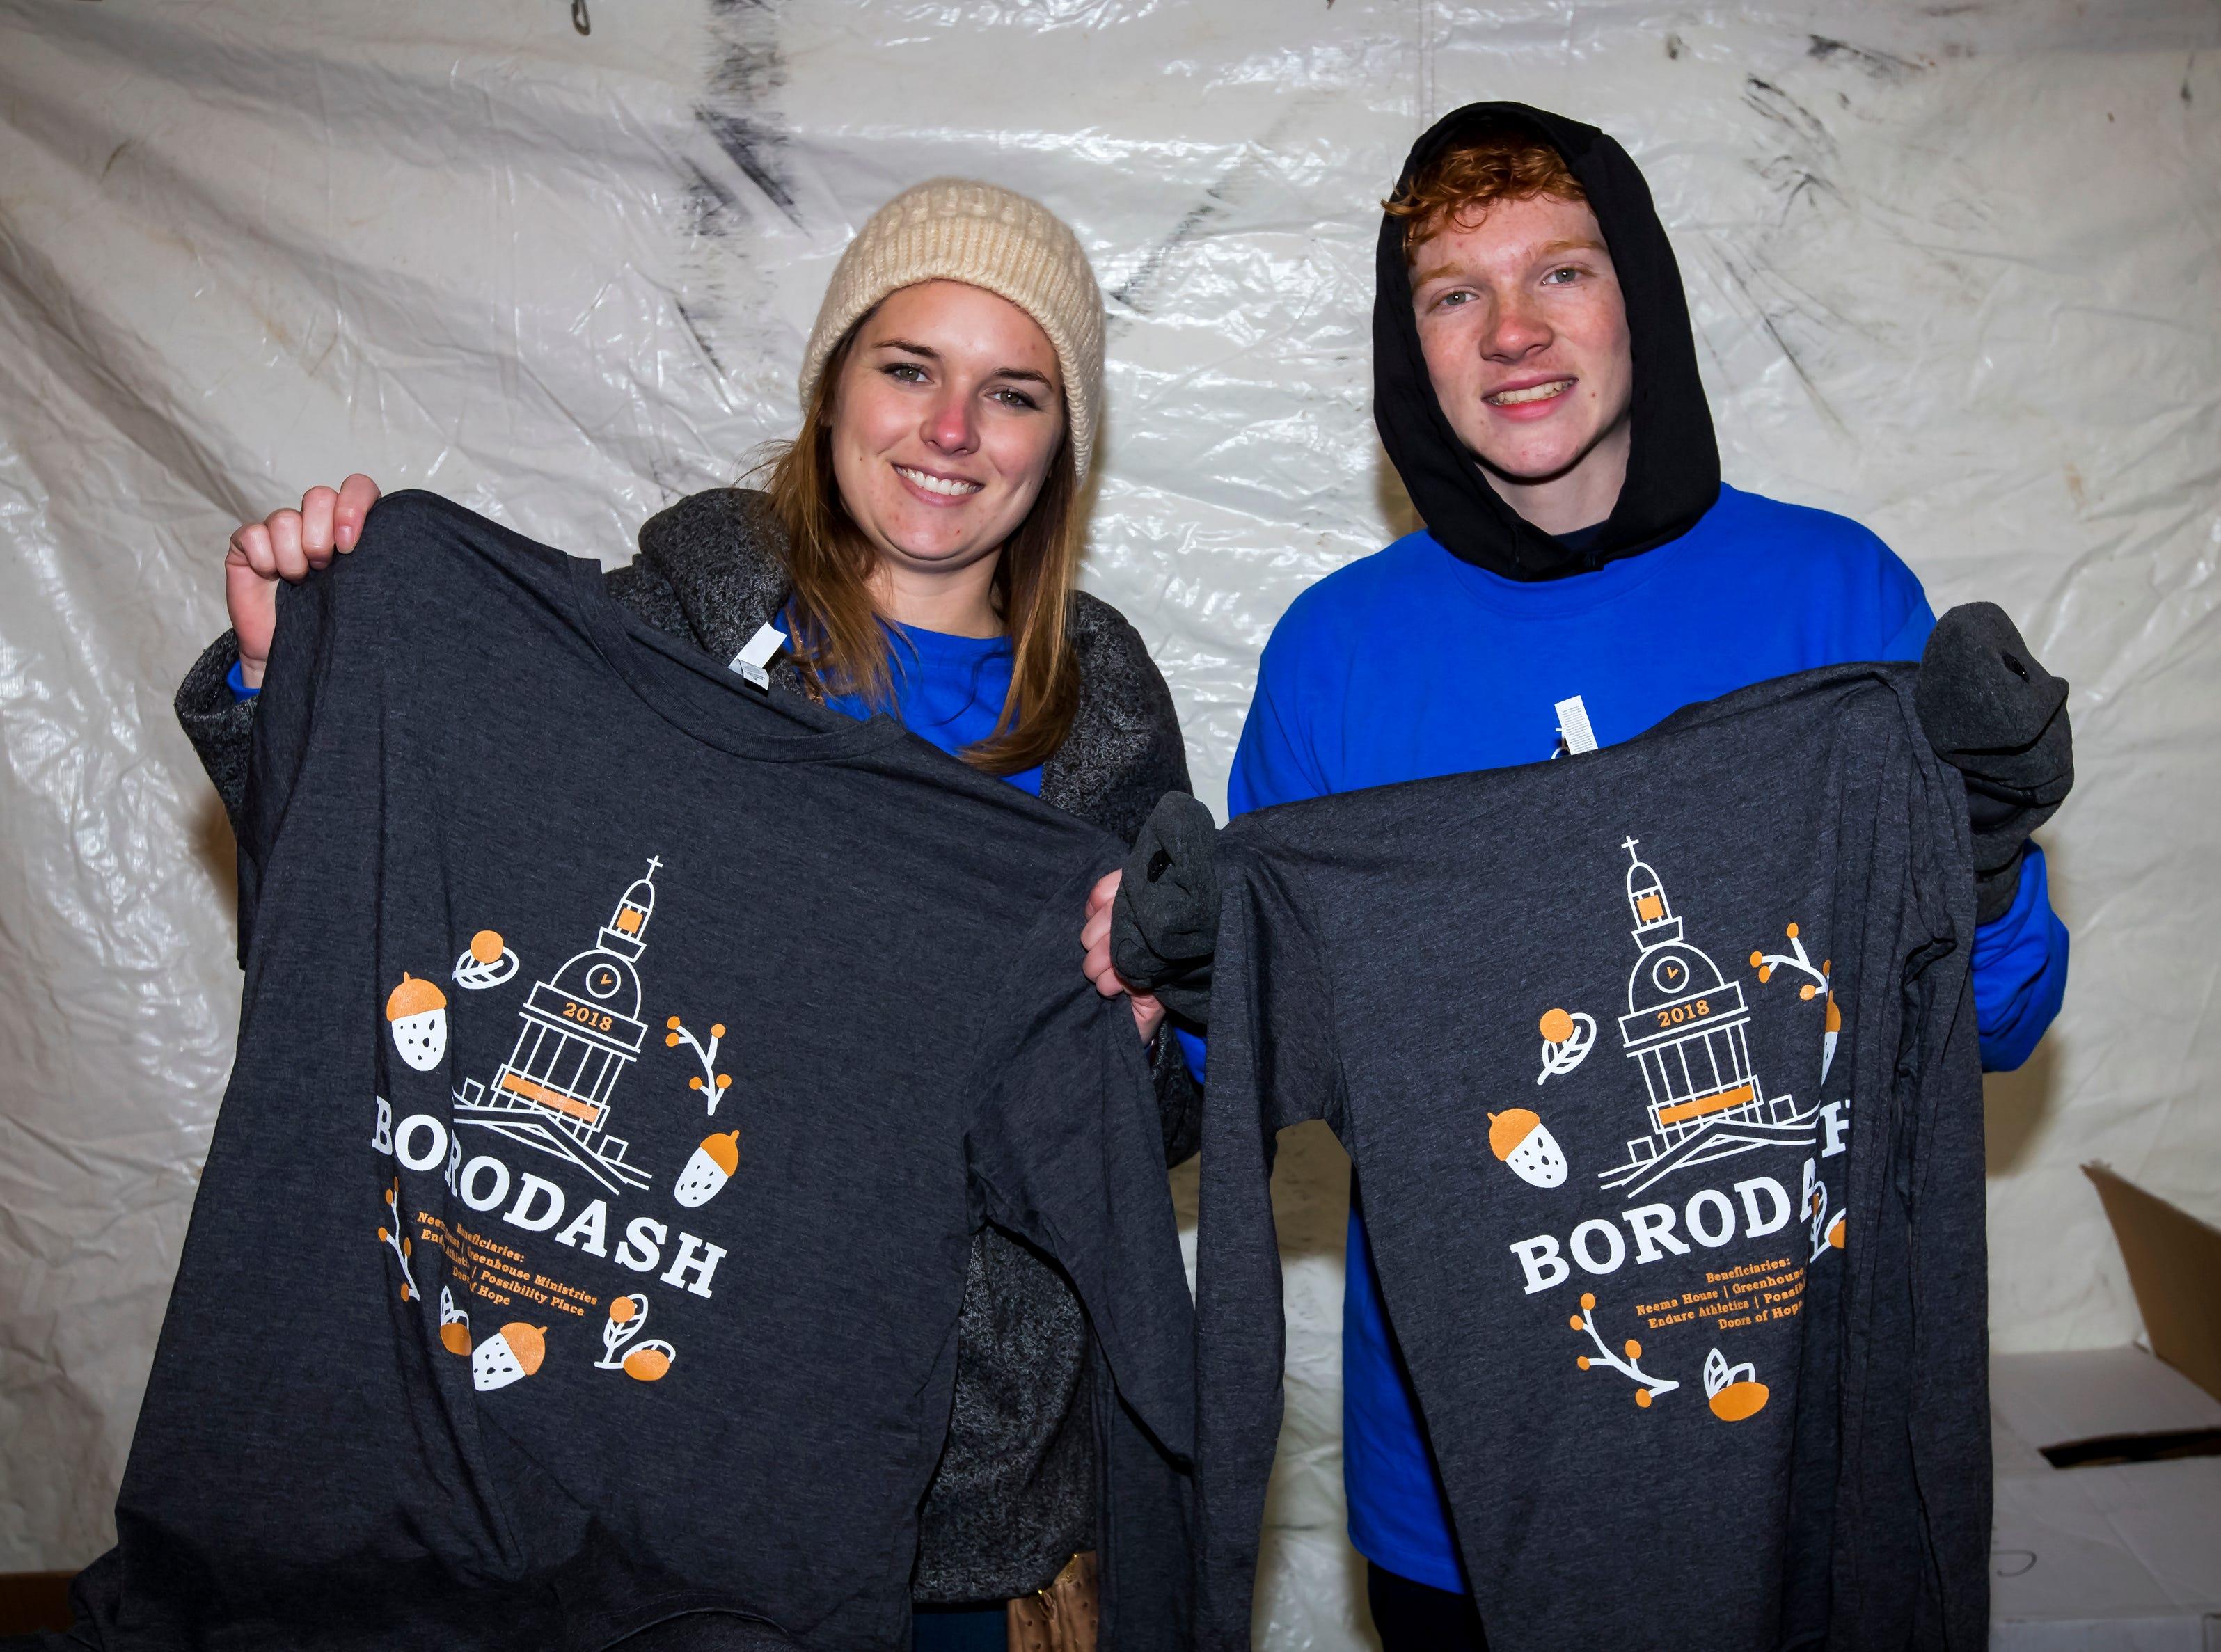 Samantha Naes and Nolan Blair at  the Thanksgiving Day Borodash. A 4-mile walk/run through historic Murfreesboro.Jim Davis/for the DNJ